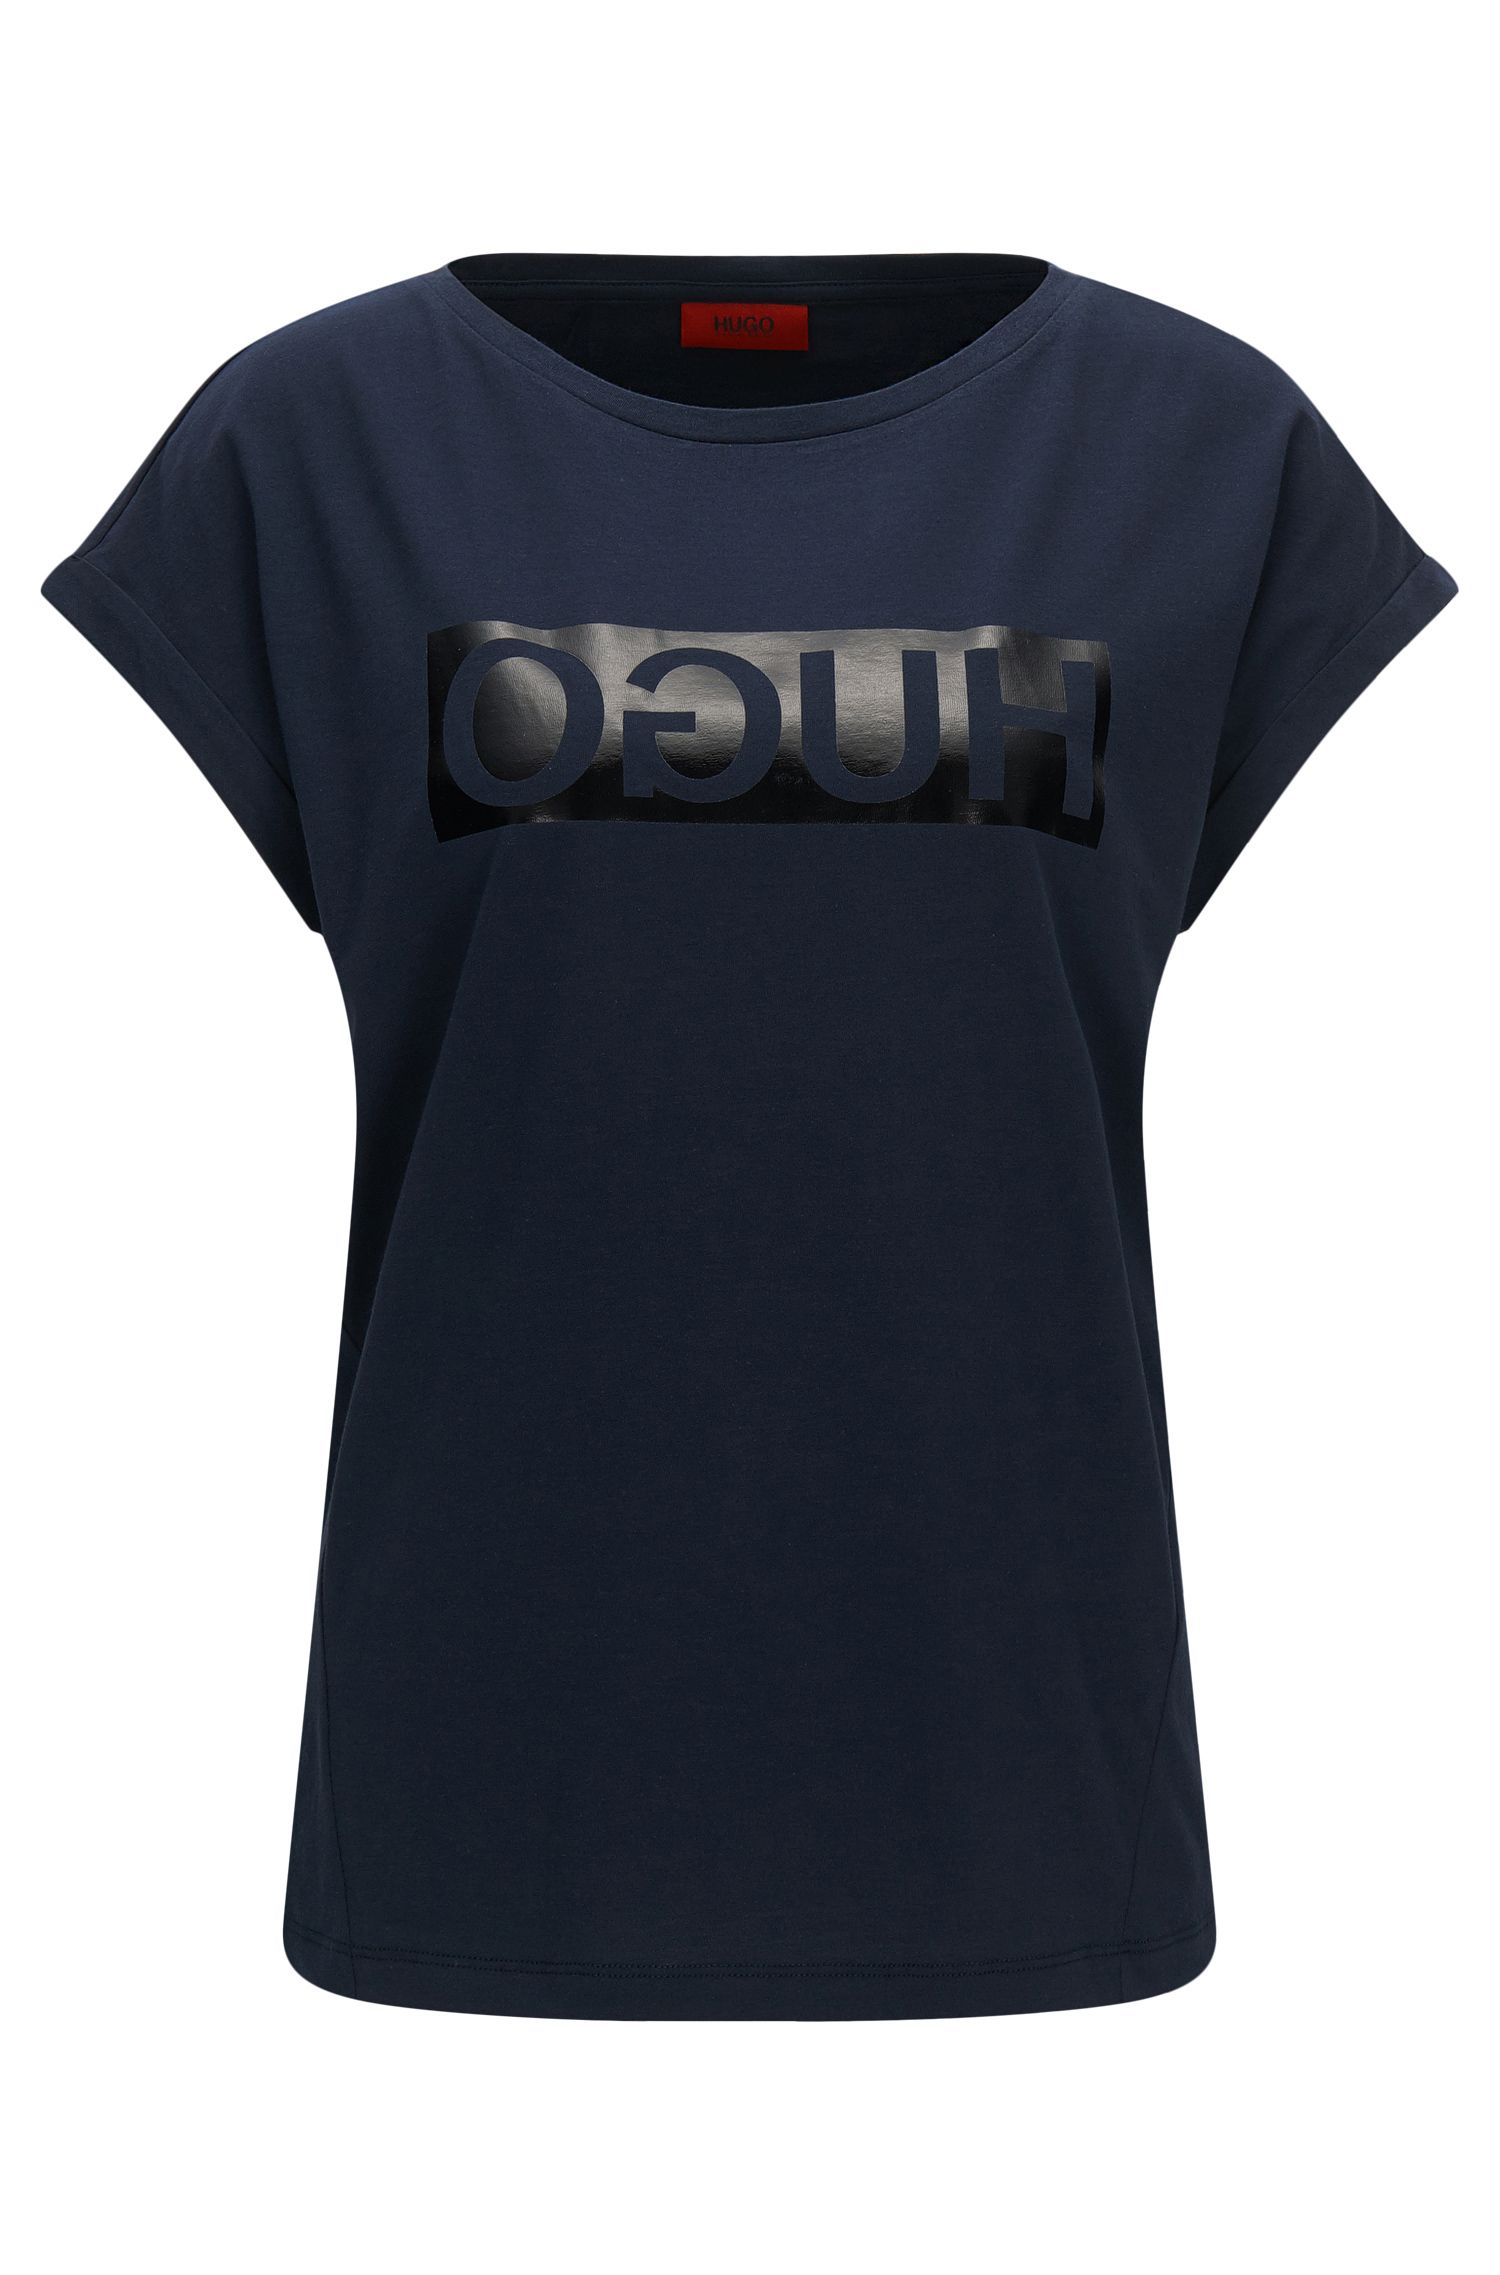 T-shirt relaxed fit in cotone con logo a rovescio